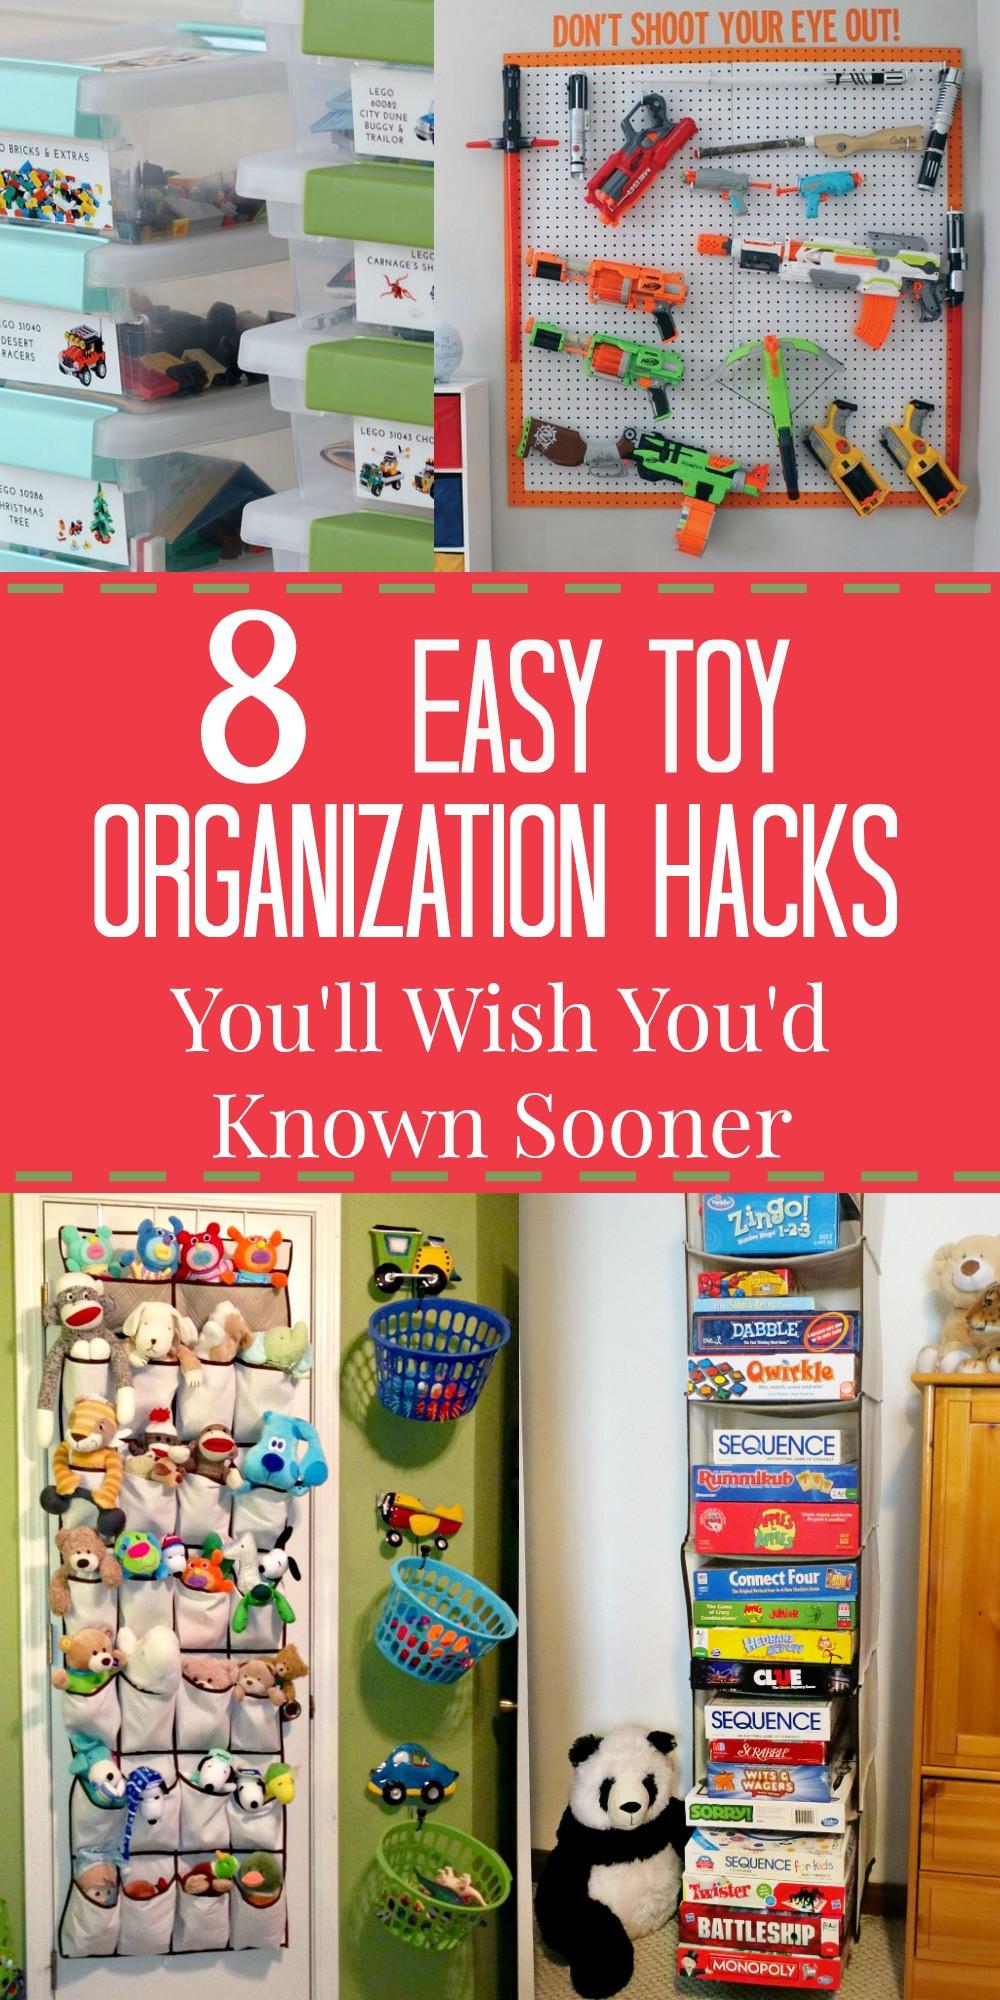 Kids Toy Organizing Ideas  8 Ridiculously Easy Toy Organization Hacks You ll Wish You